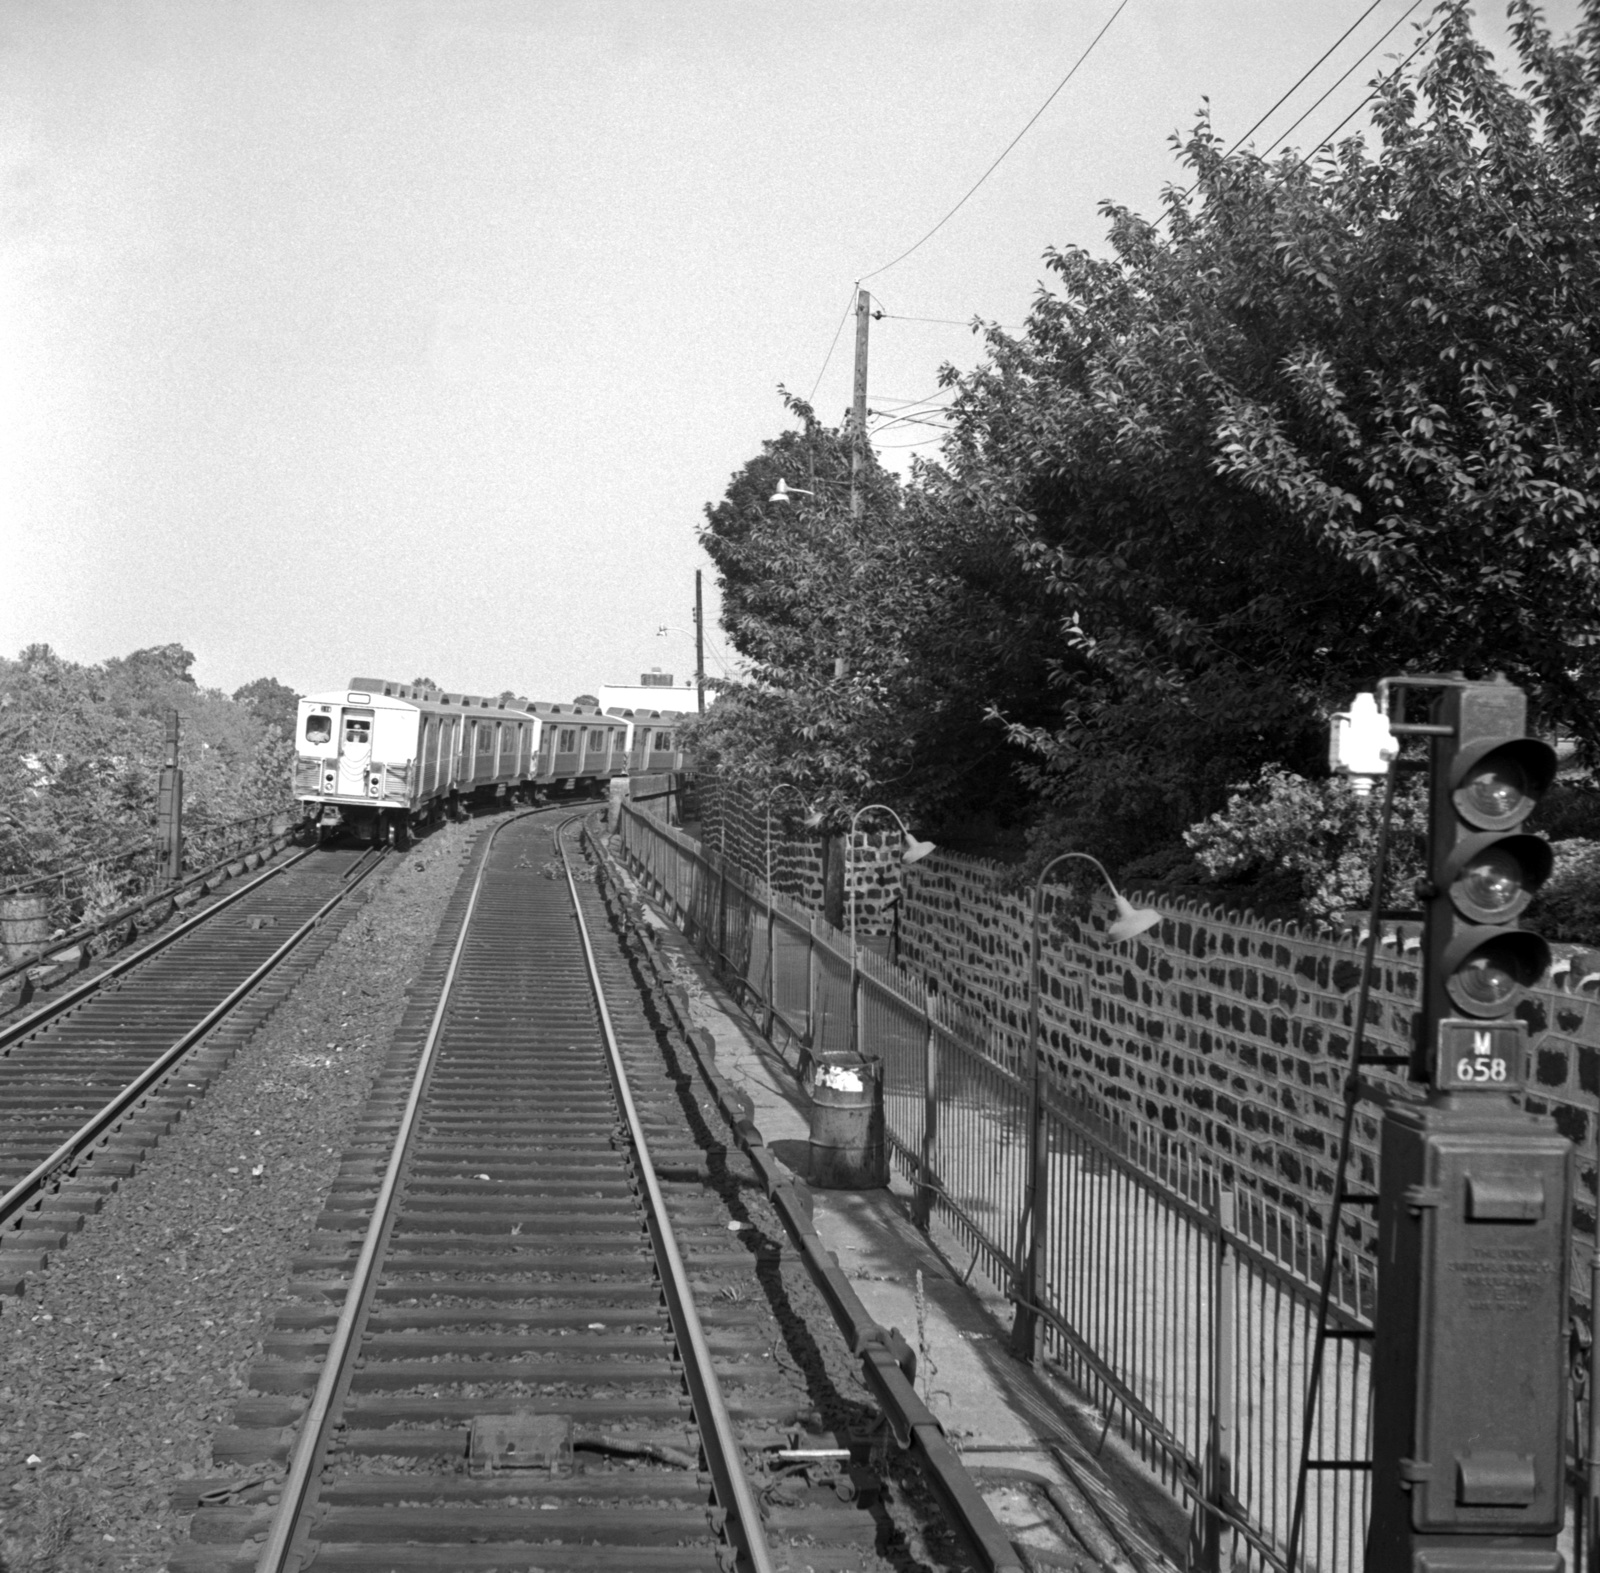 (850k, 1600x1573)<br><b>Country:</b> United States<br><b>City:</b> Philadelphia, PA<br><b>System:</b> SEPTA (or Predecessor)<br><b>Line:</b> Market-Frankford El<br><b>Location:</b> Millbourne<br><b>Car:</b> SEPTA M-3 (Budd, 1960)  <br><b>Collection of:</b> David Pirmann<br><b>Date:</b> 6/12/1967<br><b>Viewed (this week/total):</b> 0 / 60